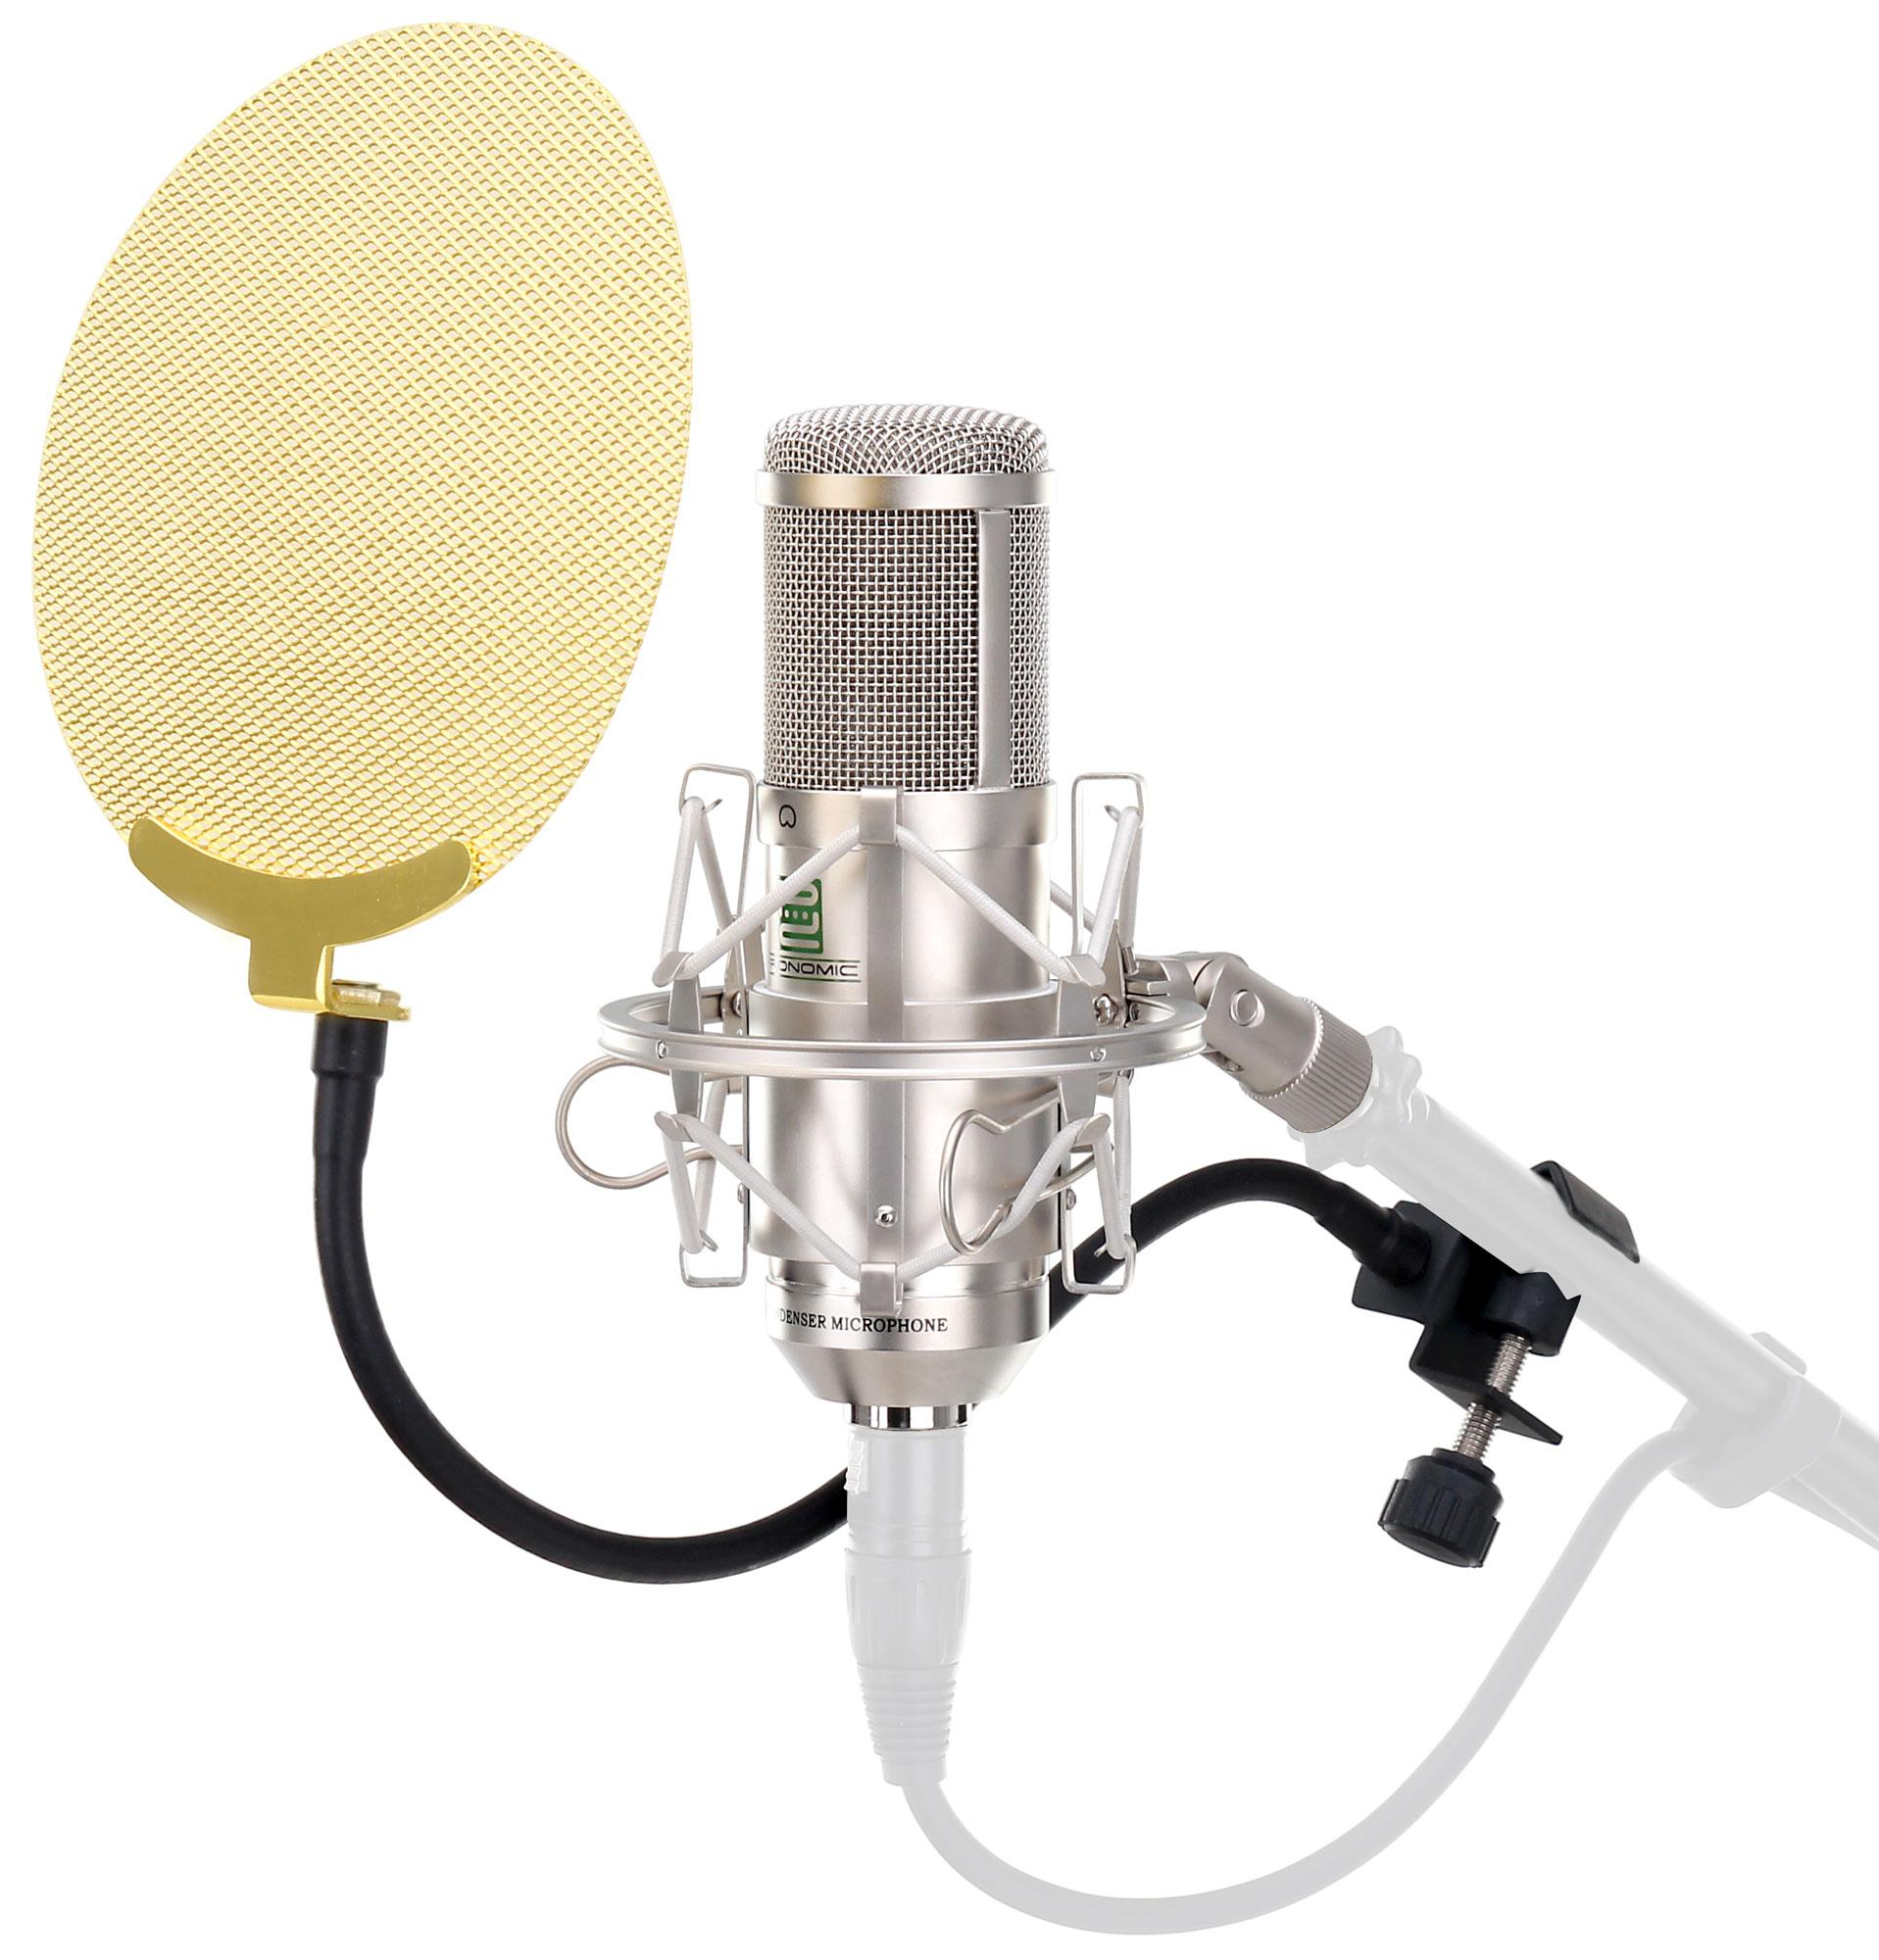 Pronomic CM 100S Studio Kondensatormikrofon silber SET inkl. Popschutz gold